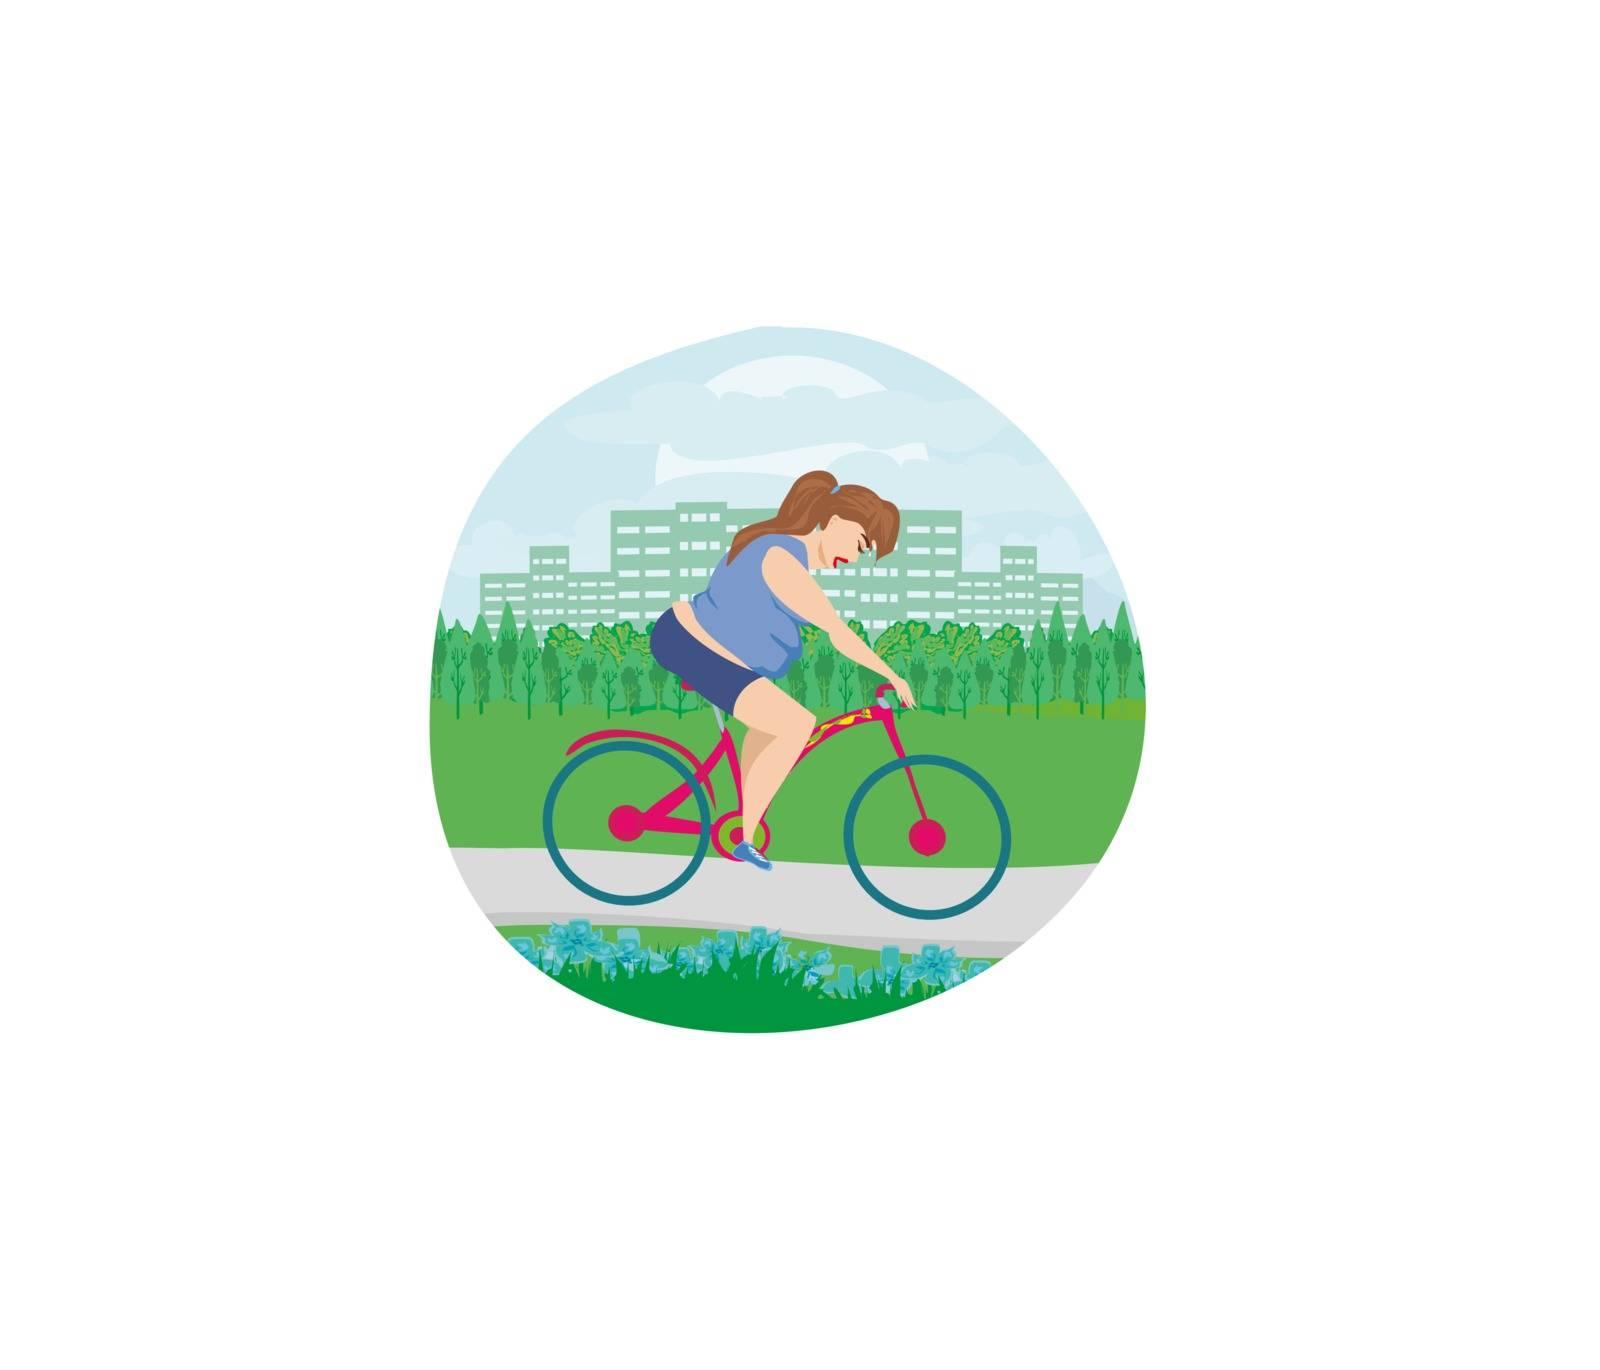 Overweight woman ride on bike